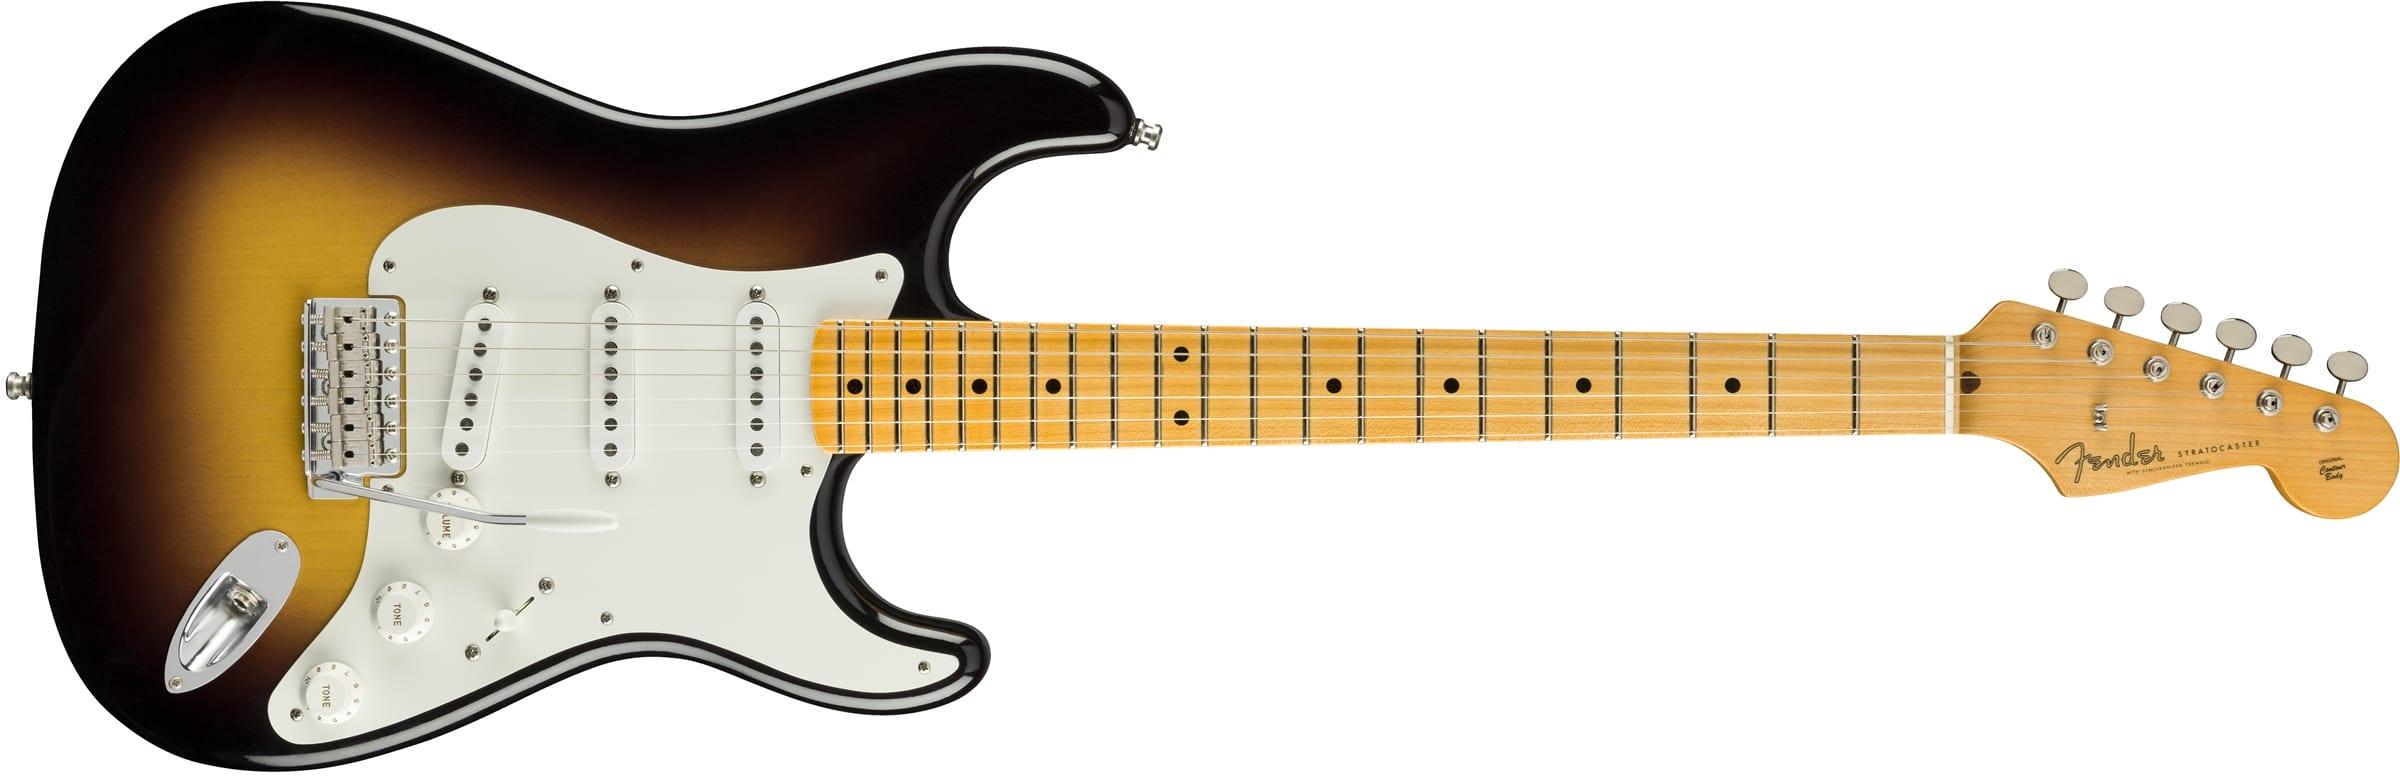 Fender Custom Shop Jimmie Vaughan Stratocaster in Sunburst